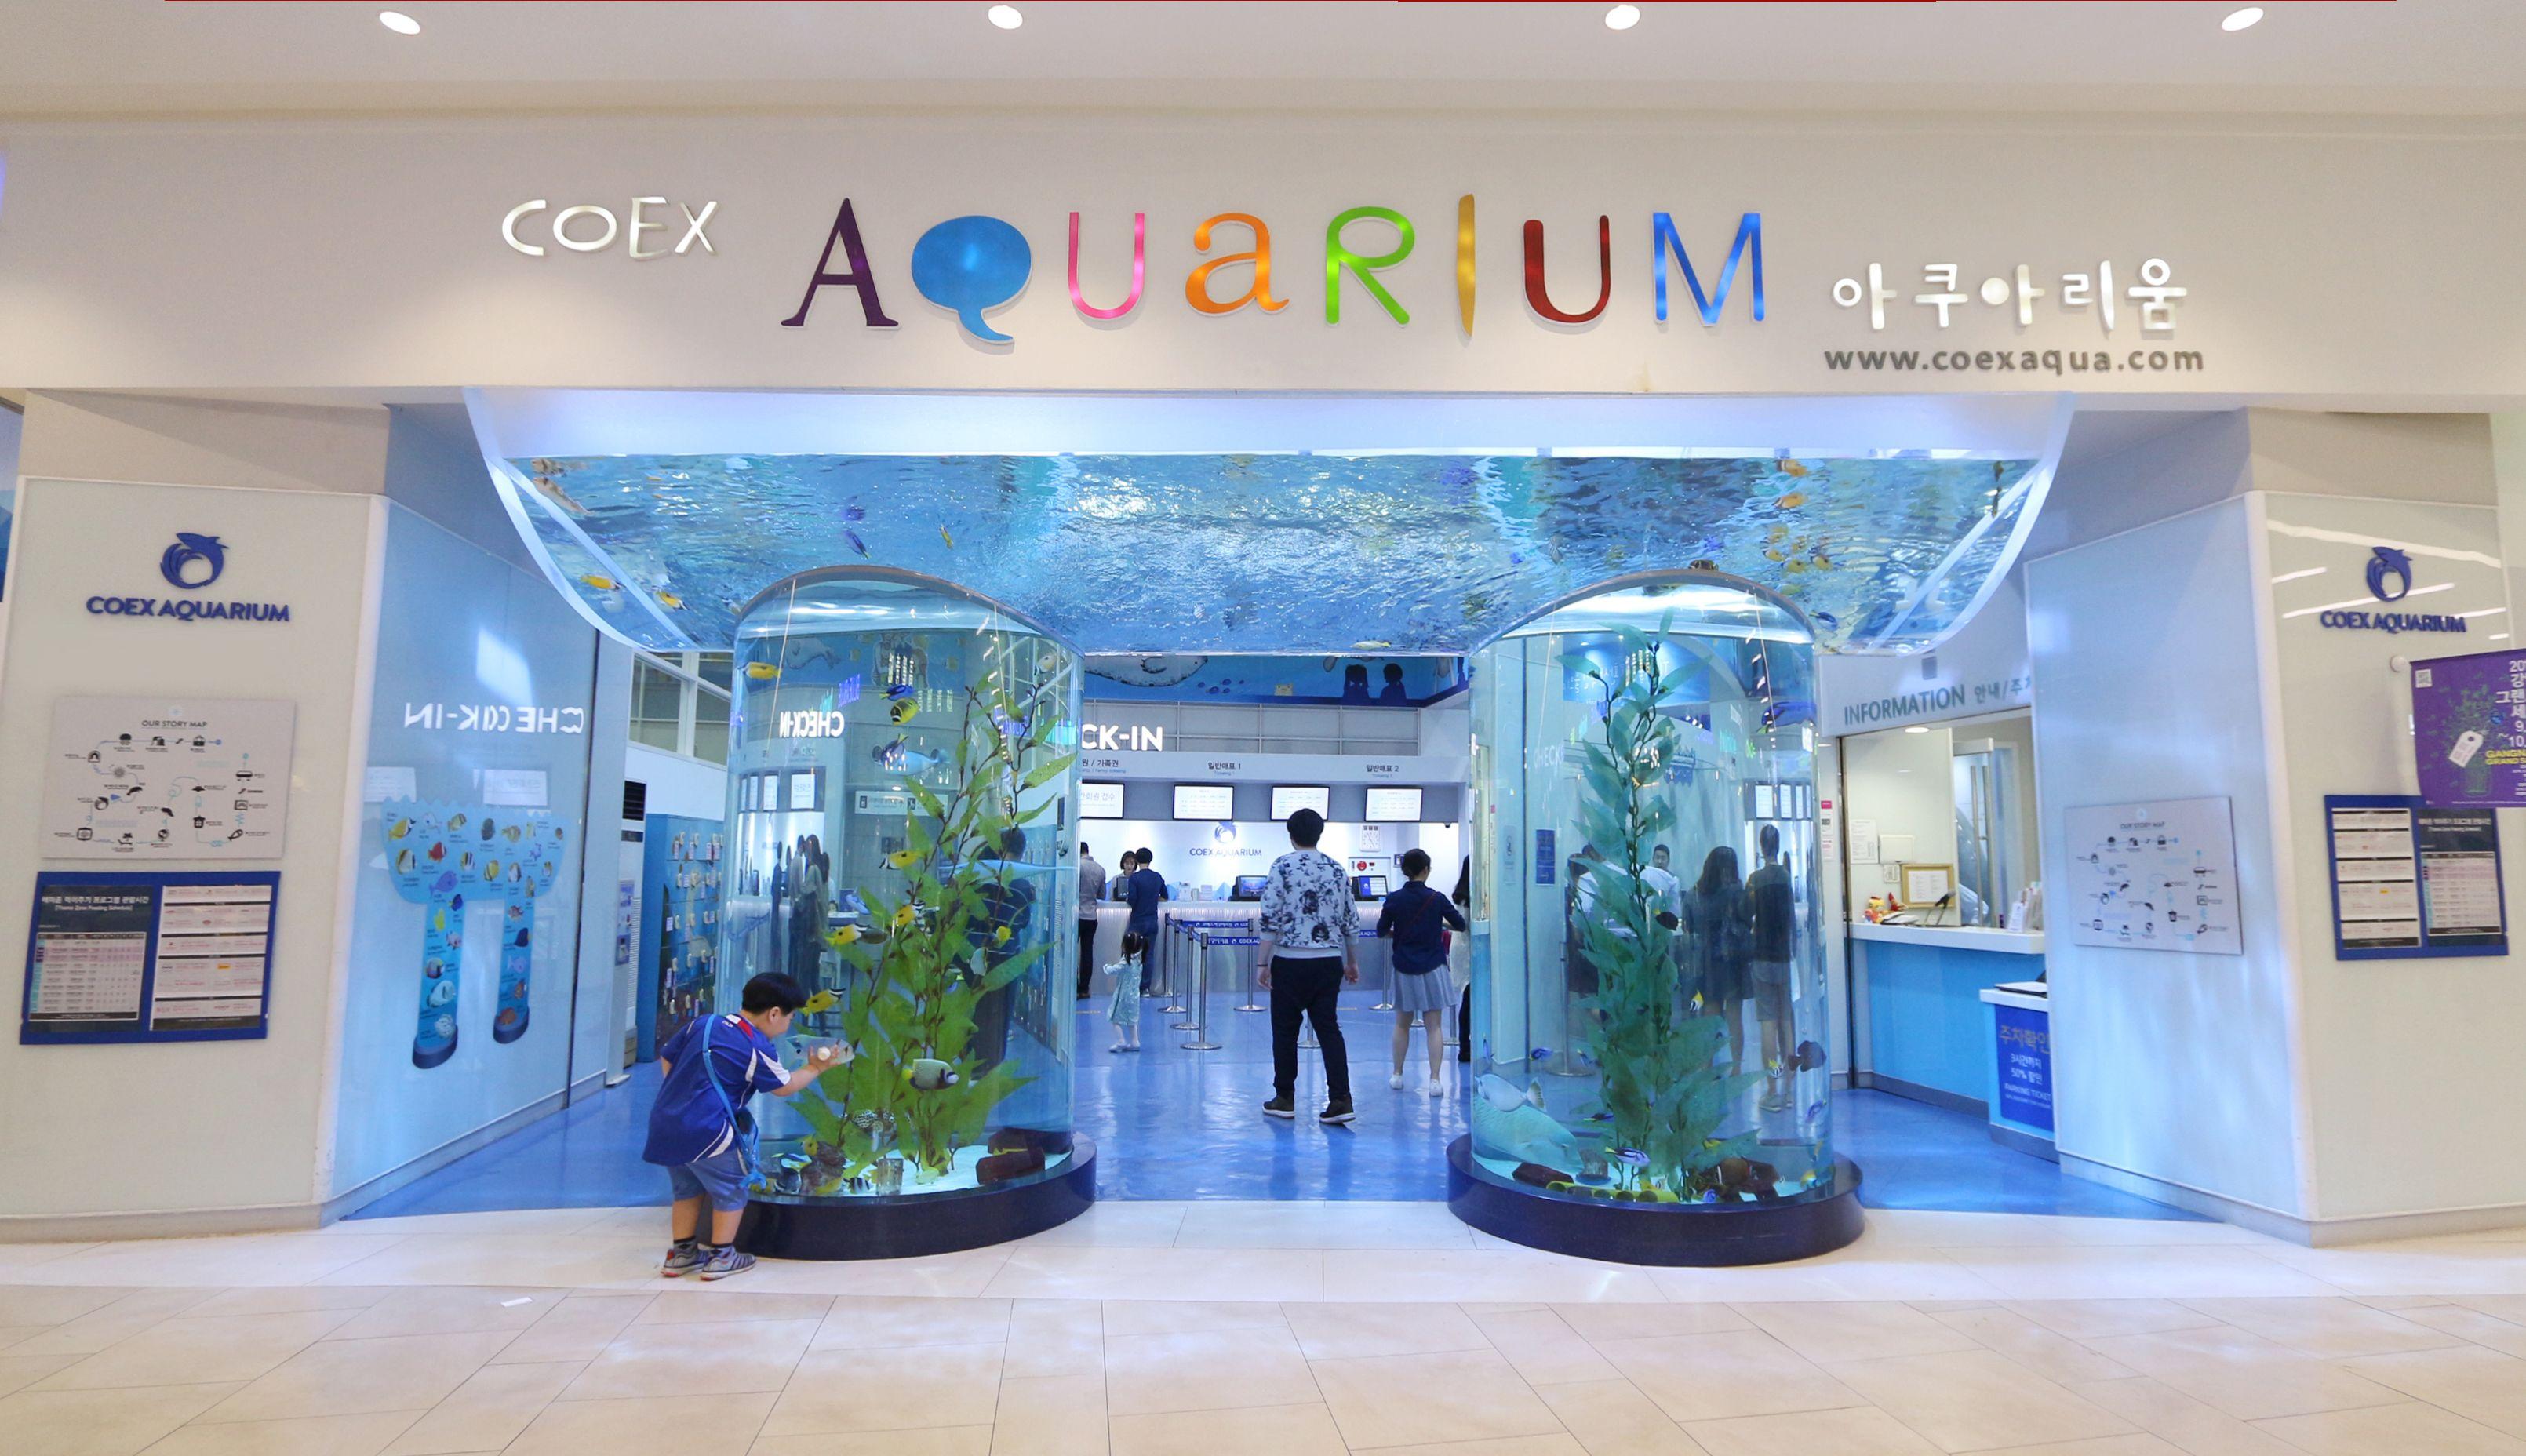 View in front of the COEX Aquarium in Seoul, South Korea